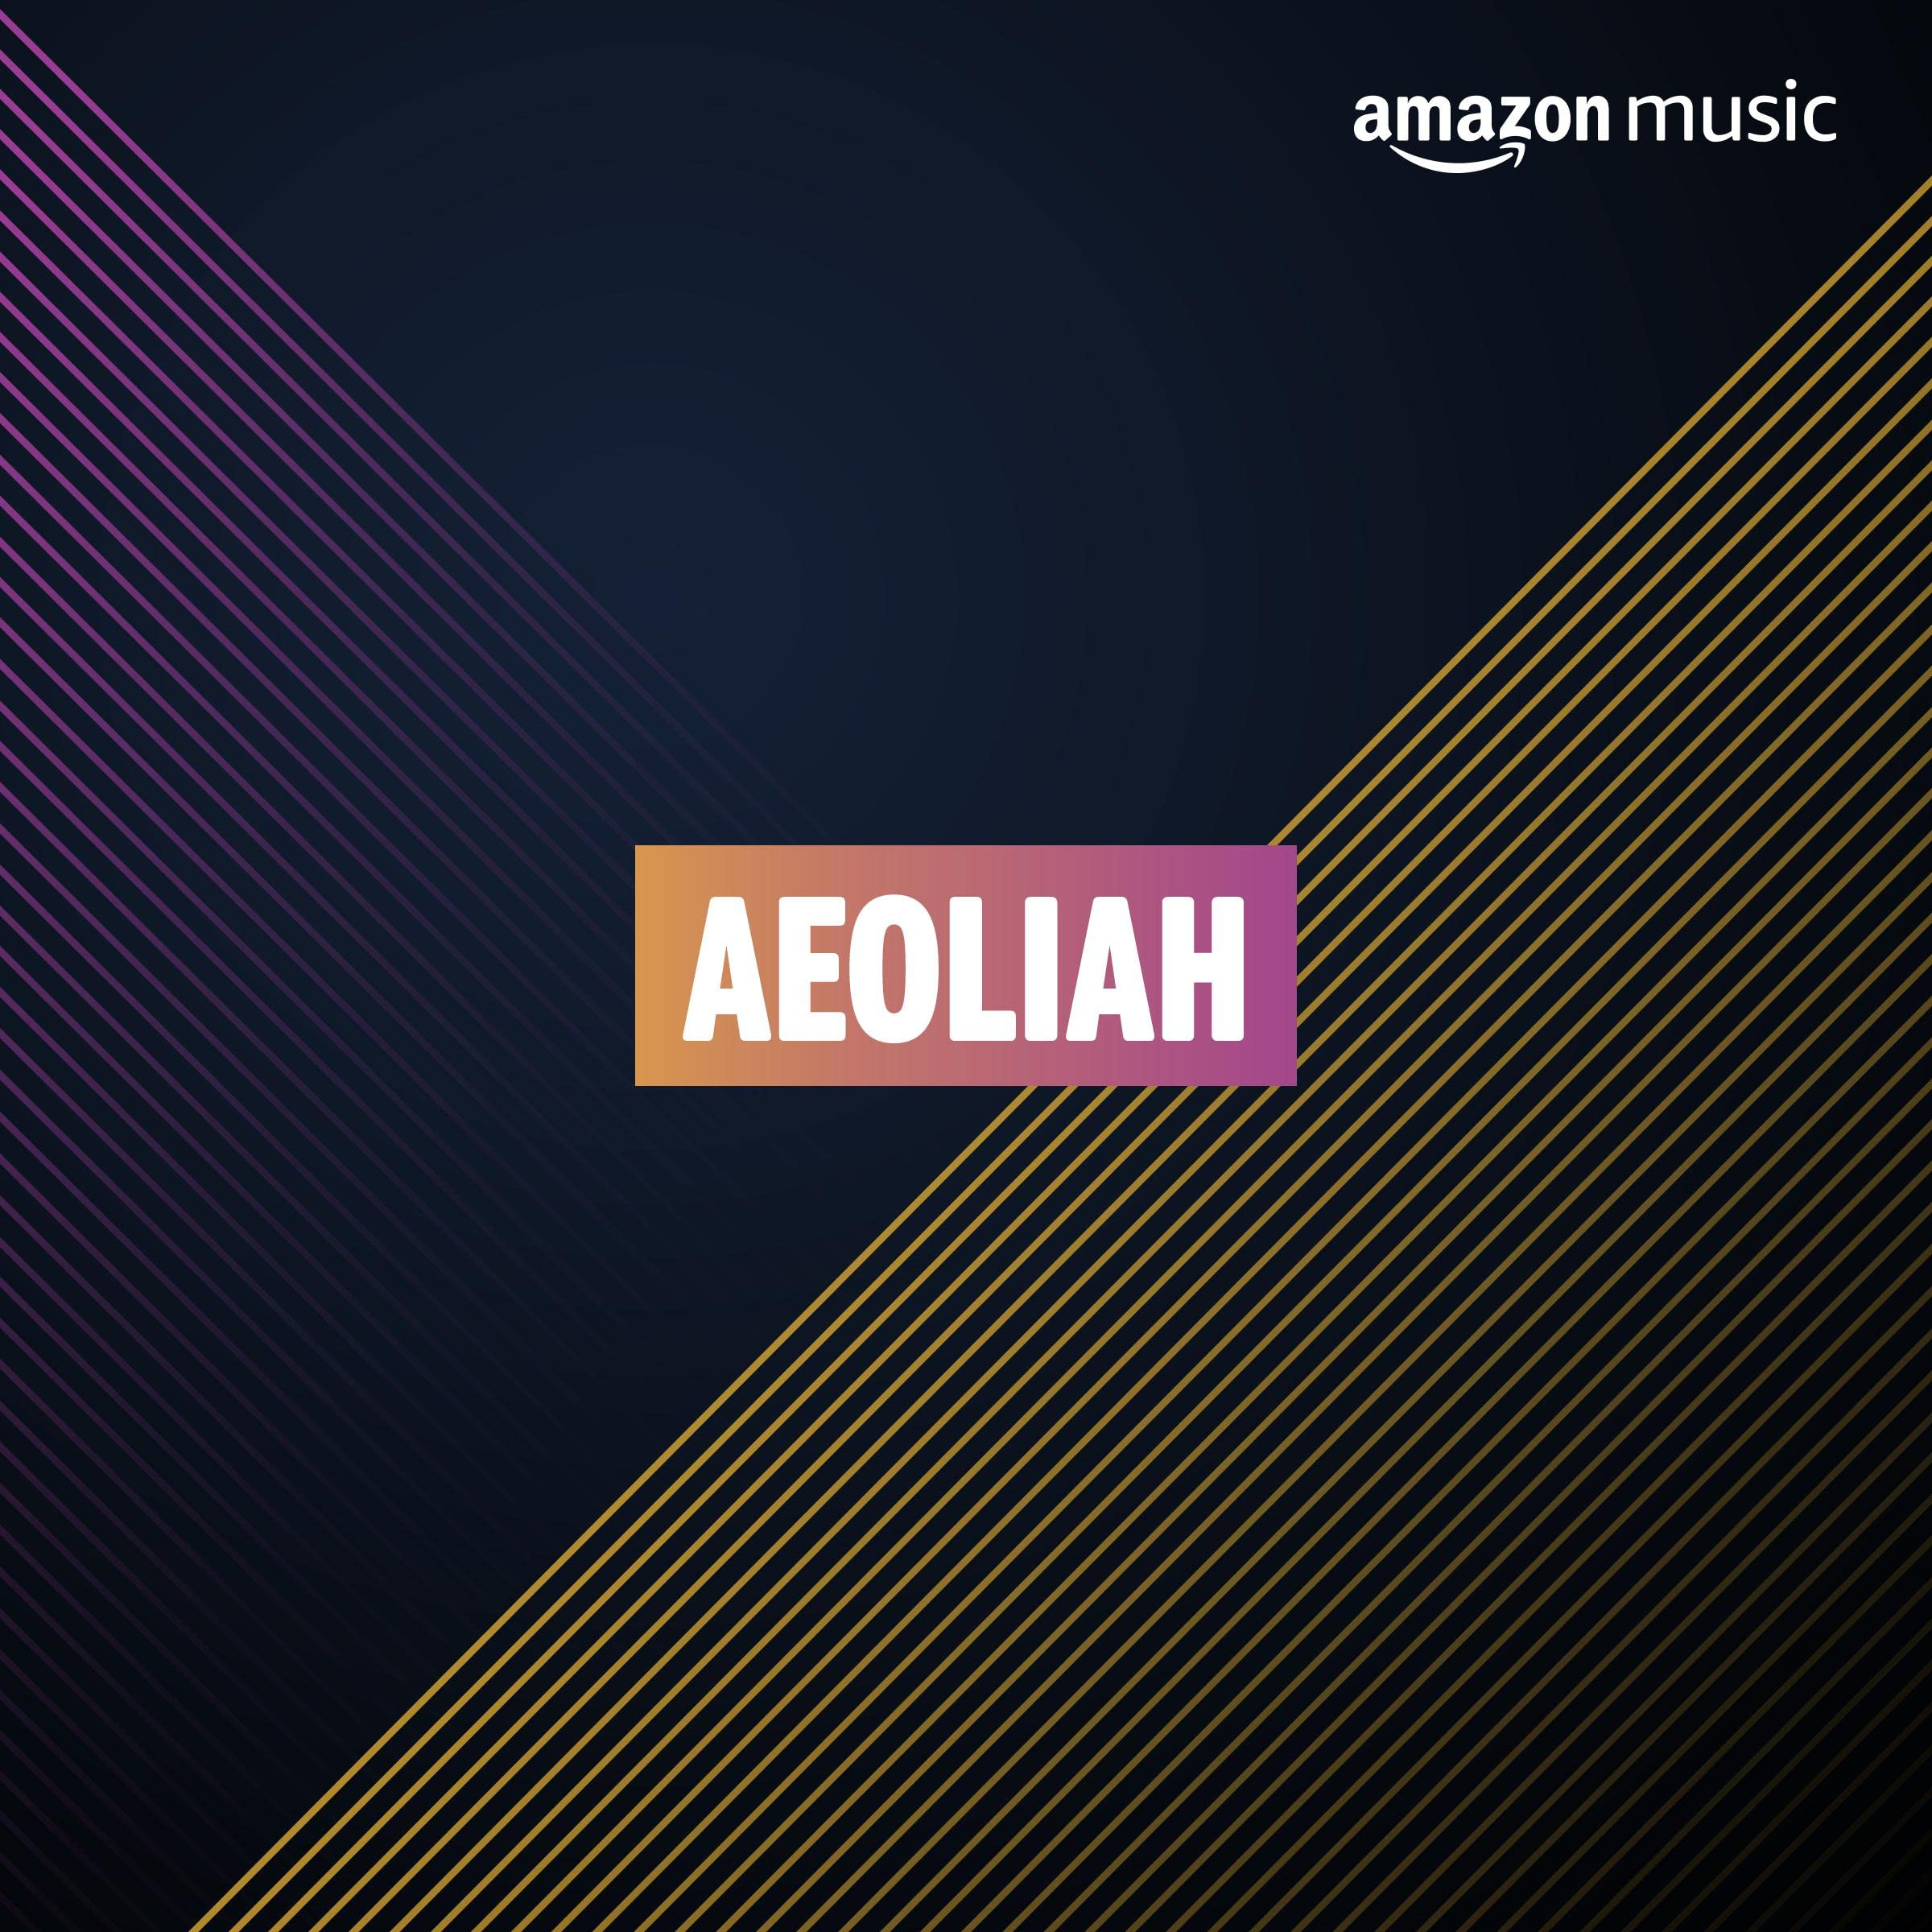 Aeoliah